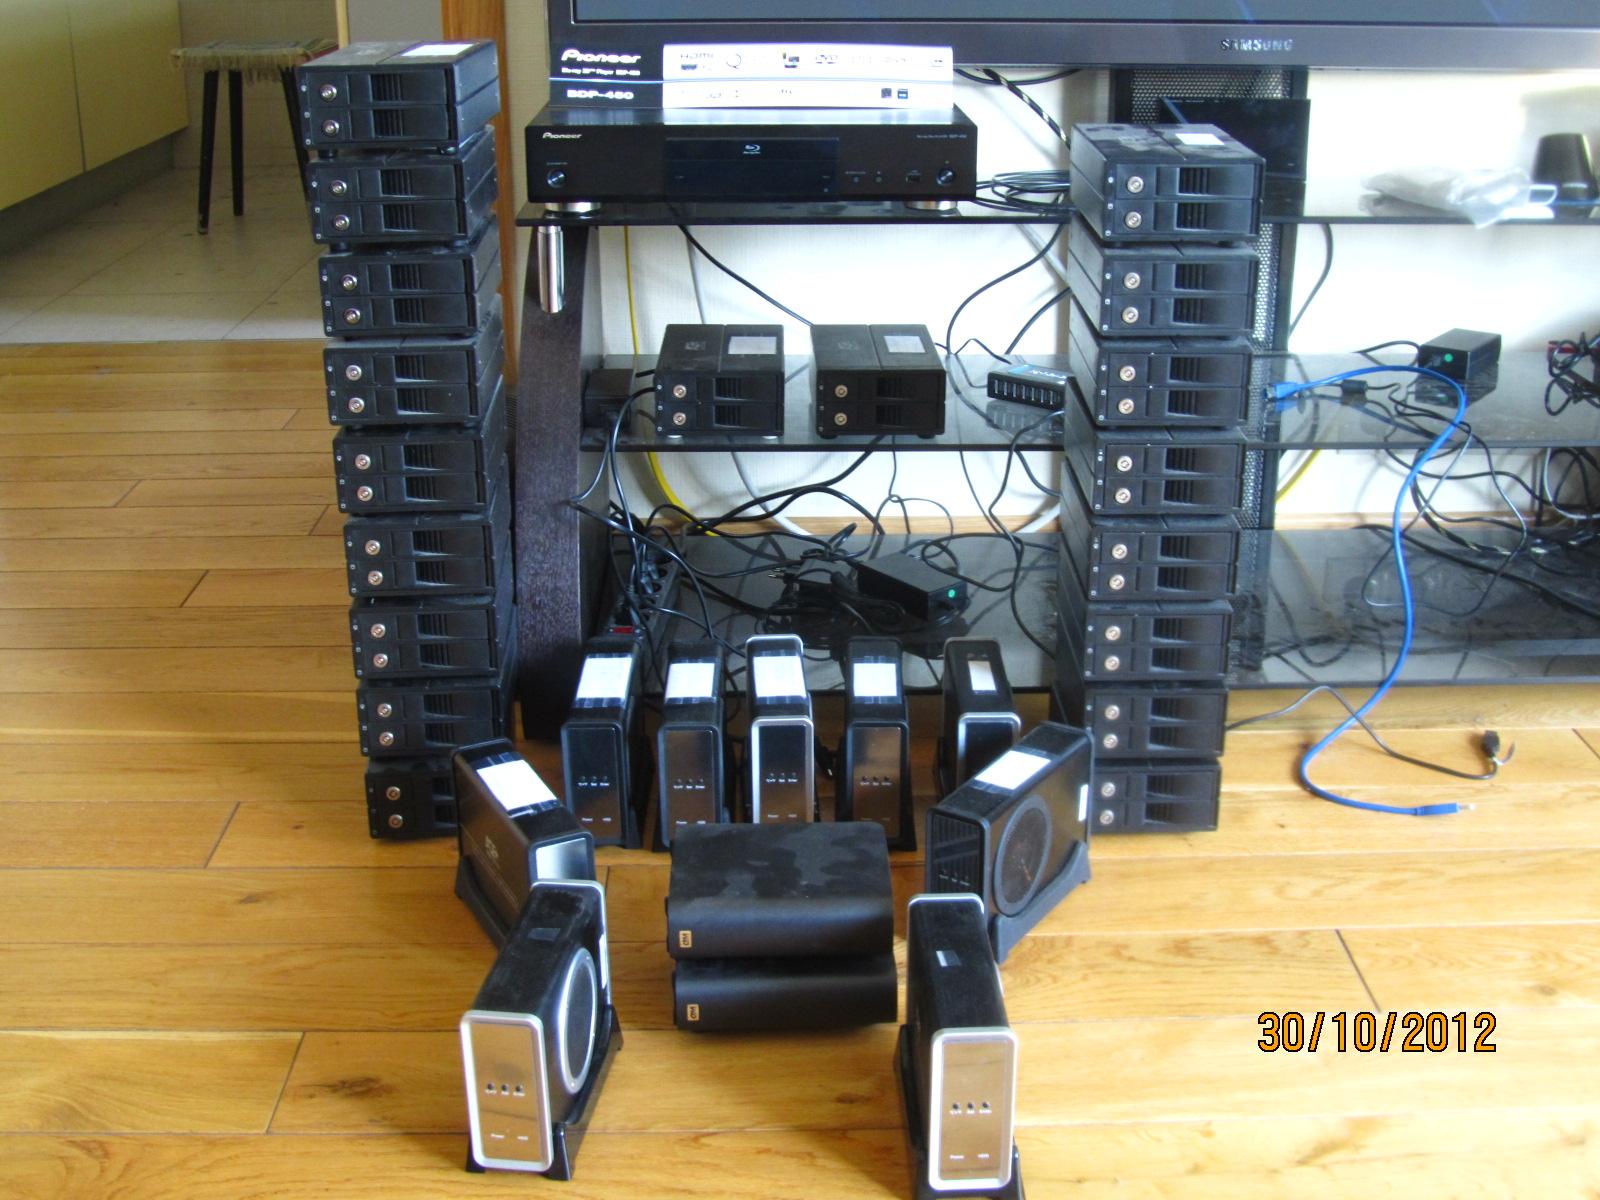 инструкция пошаговая настройки телевизора lg 47la660v